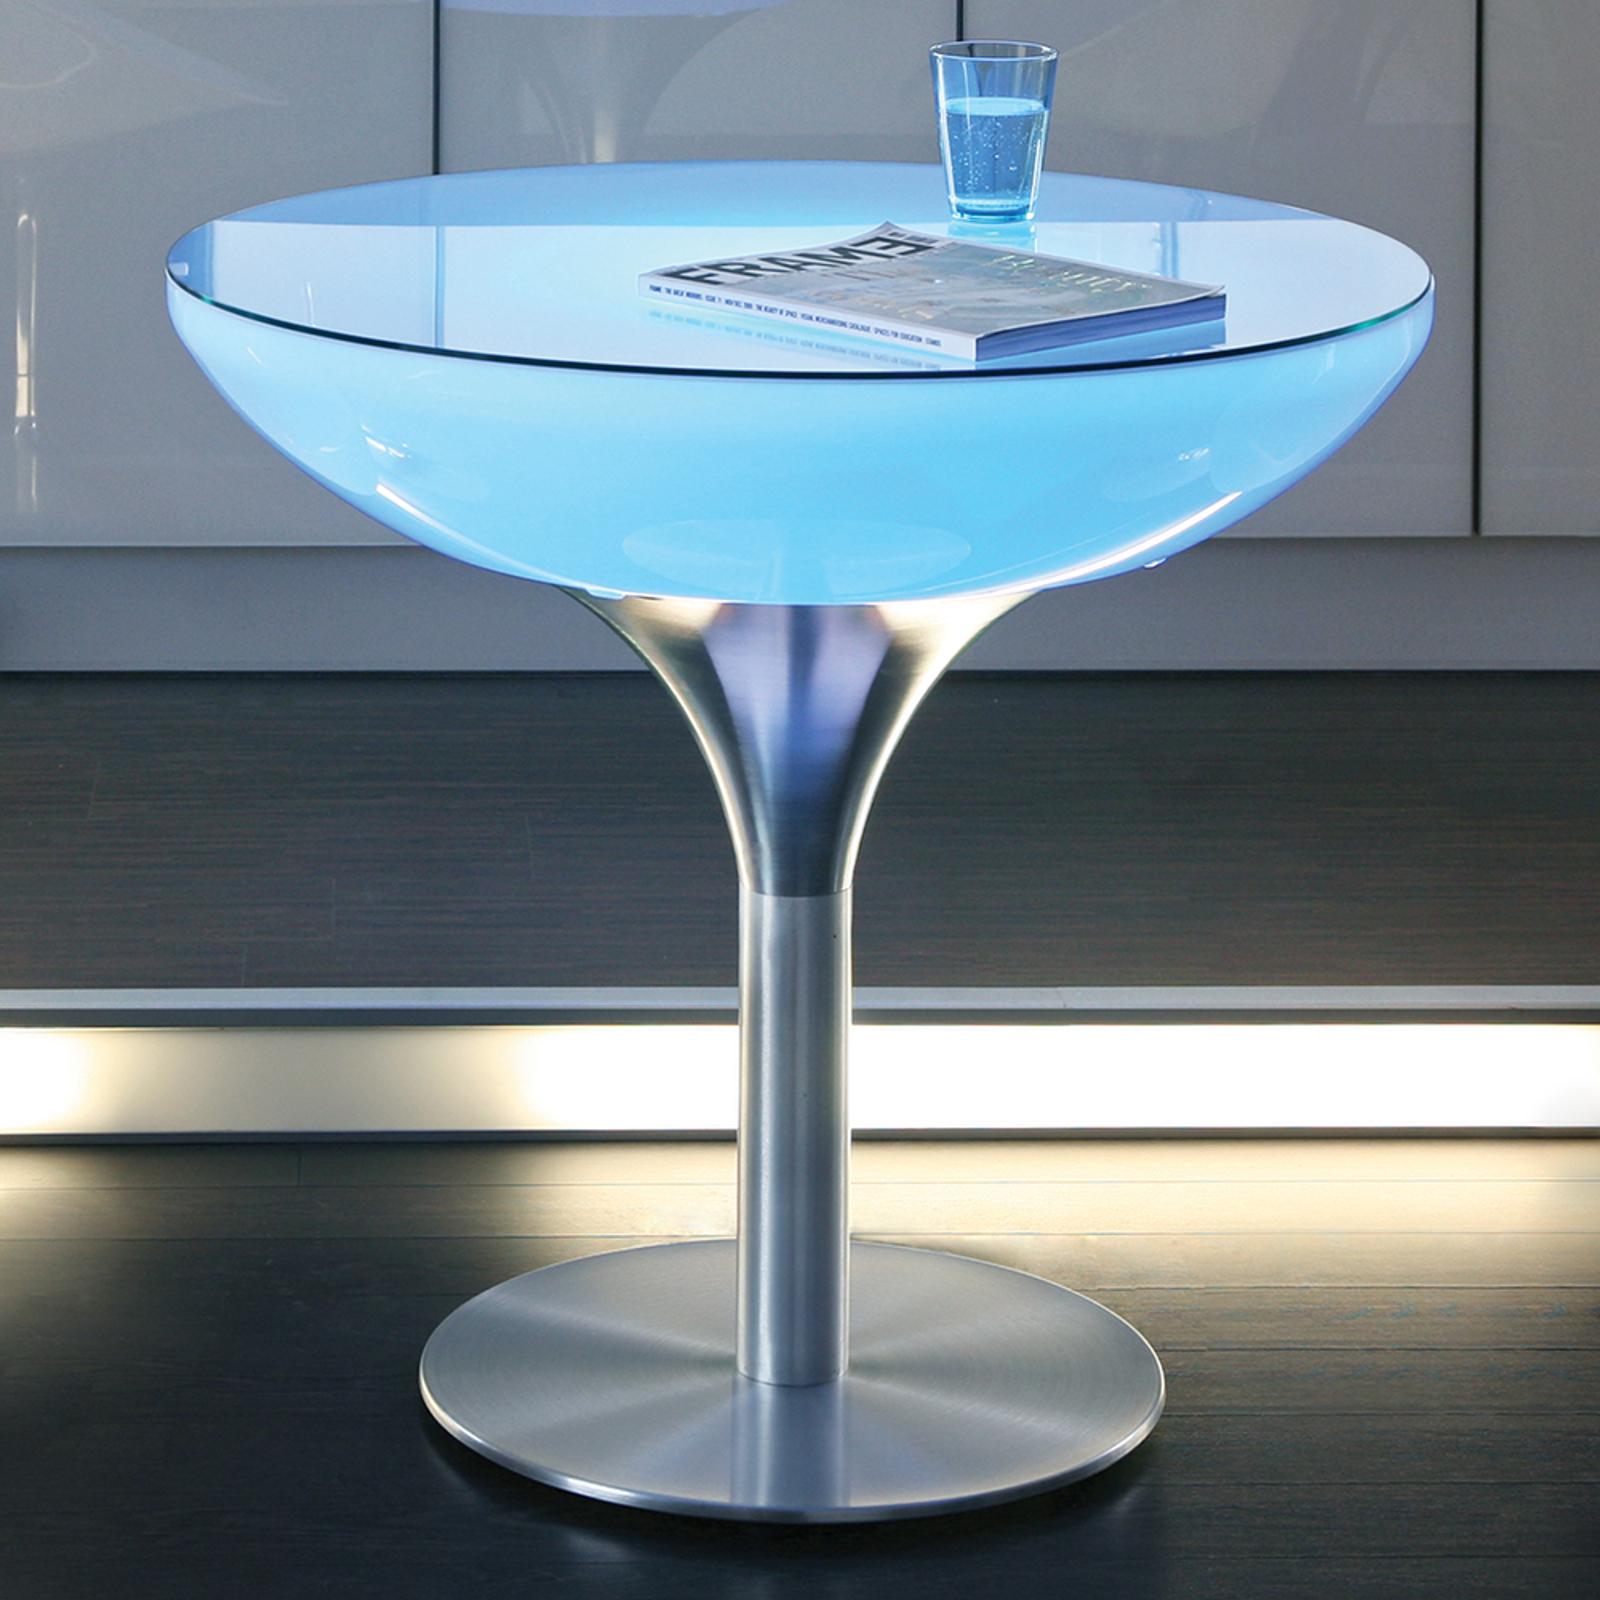 mangefarget lysende loungebord LED Pro 75 cm